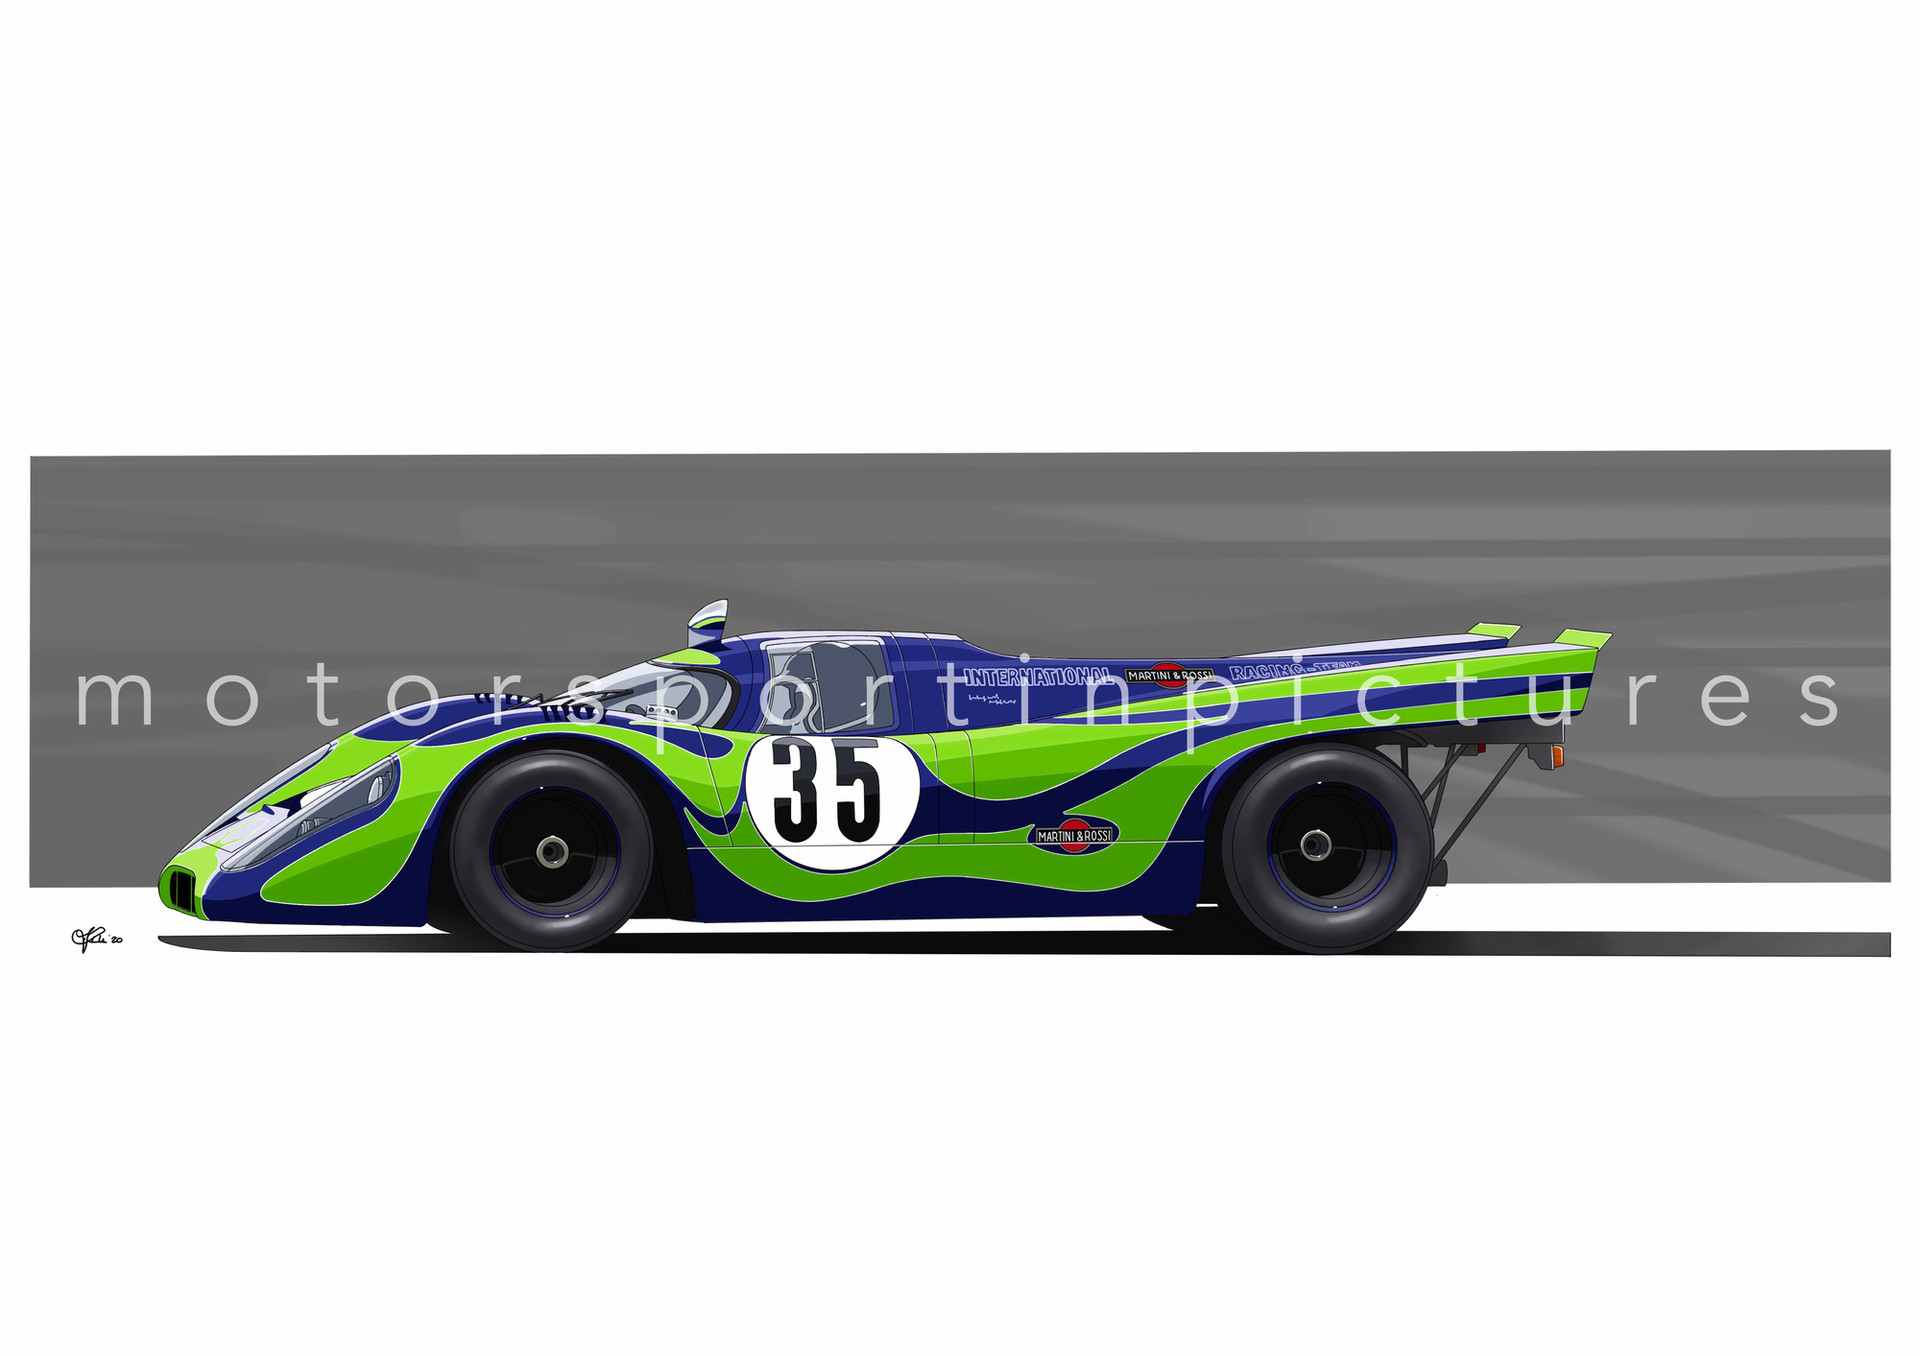 psychedelic martini racing porsche 917